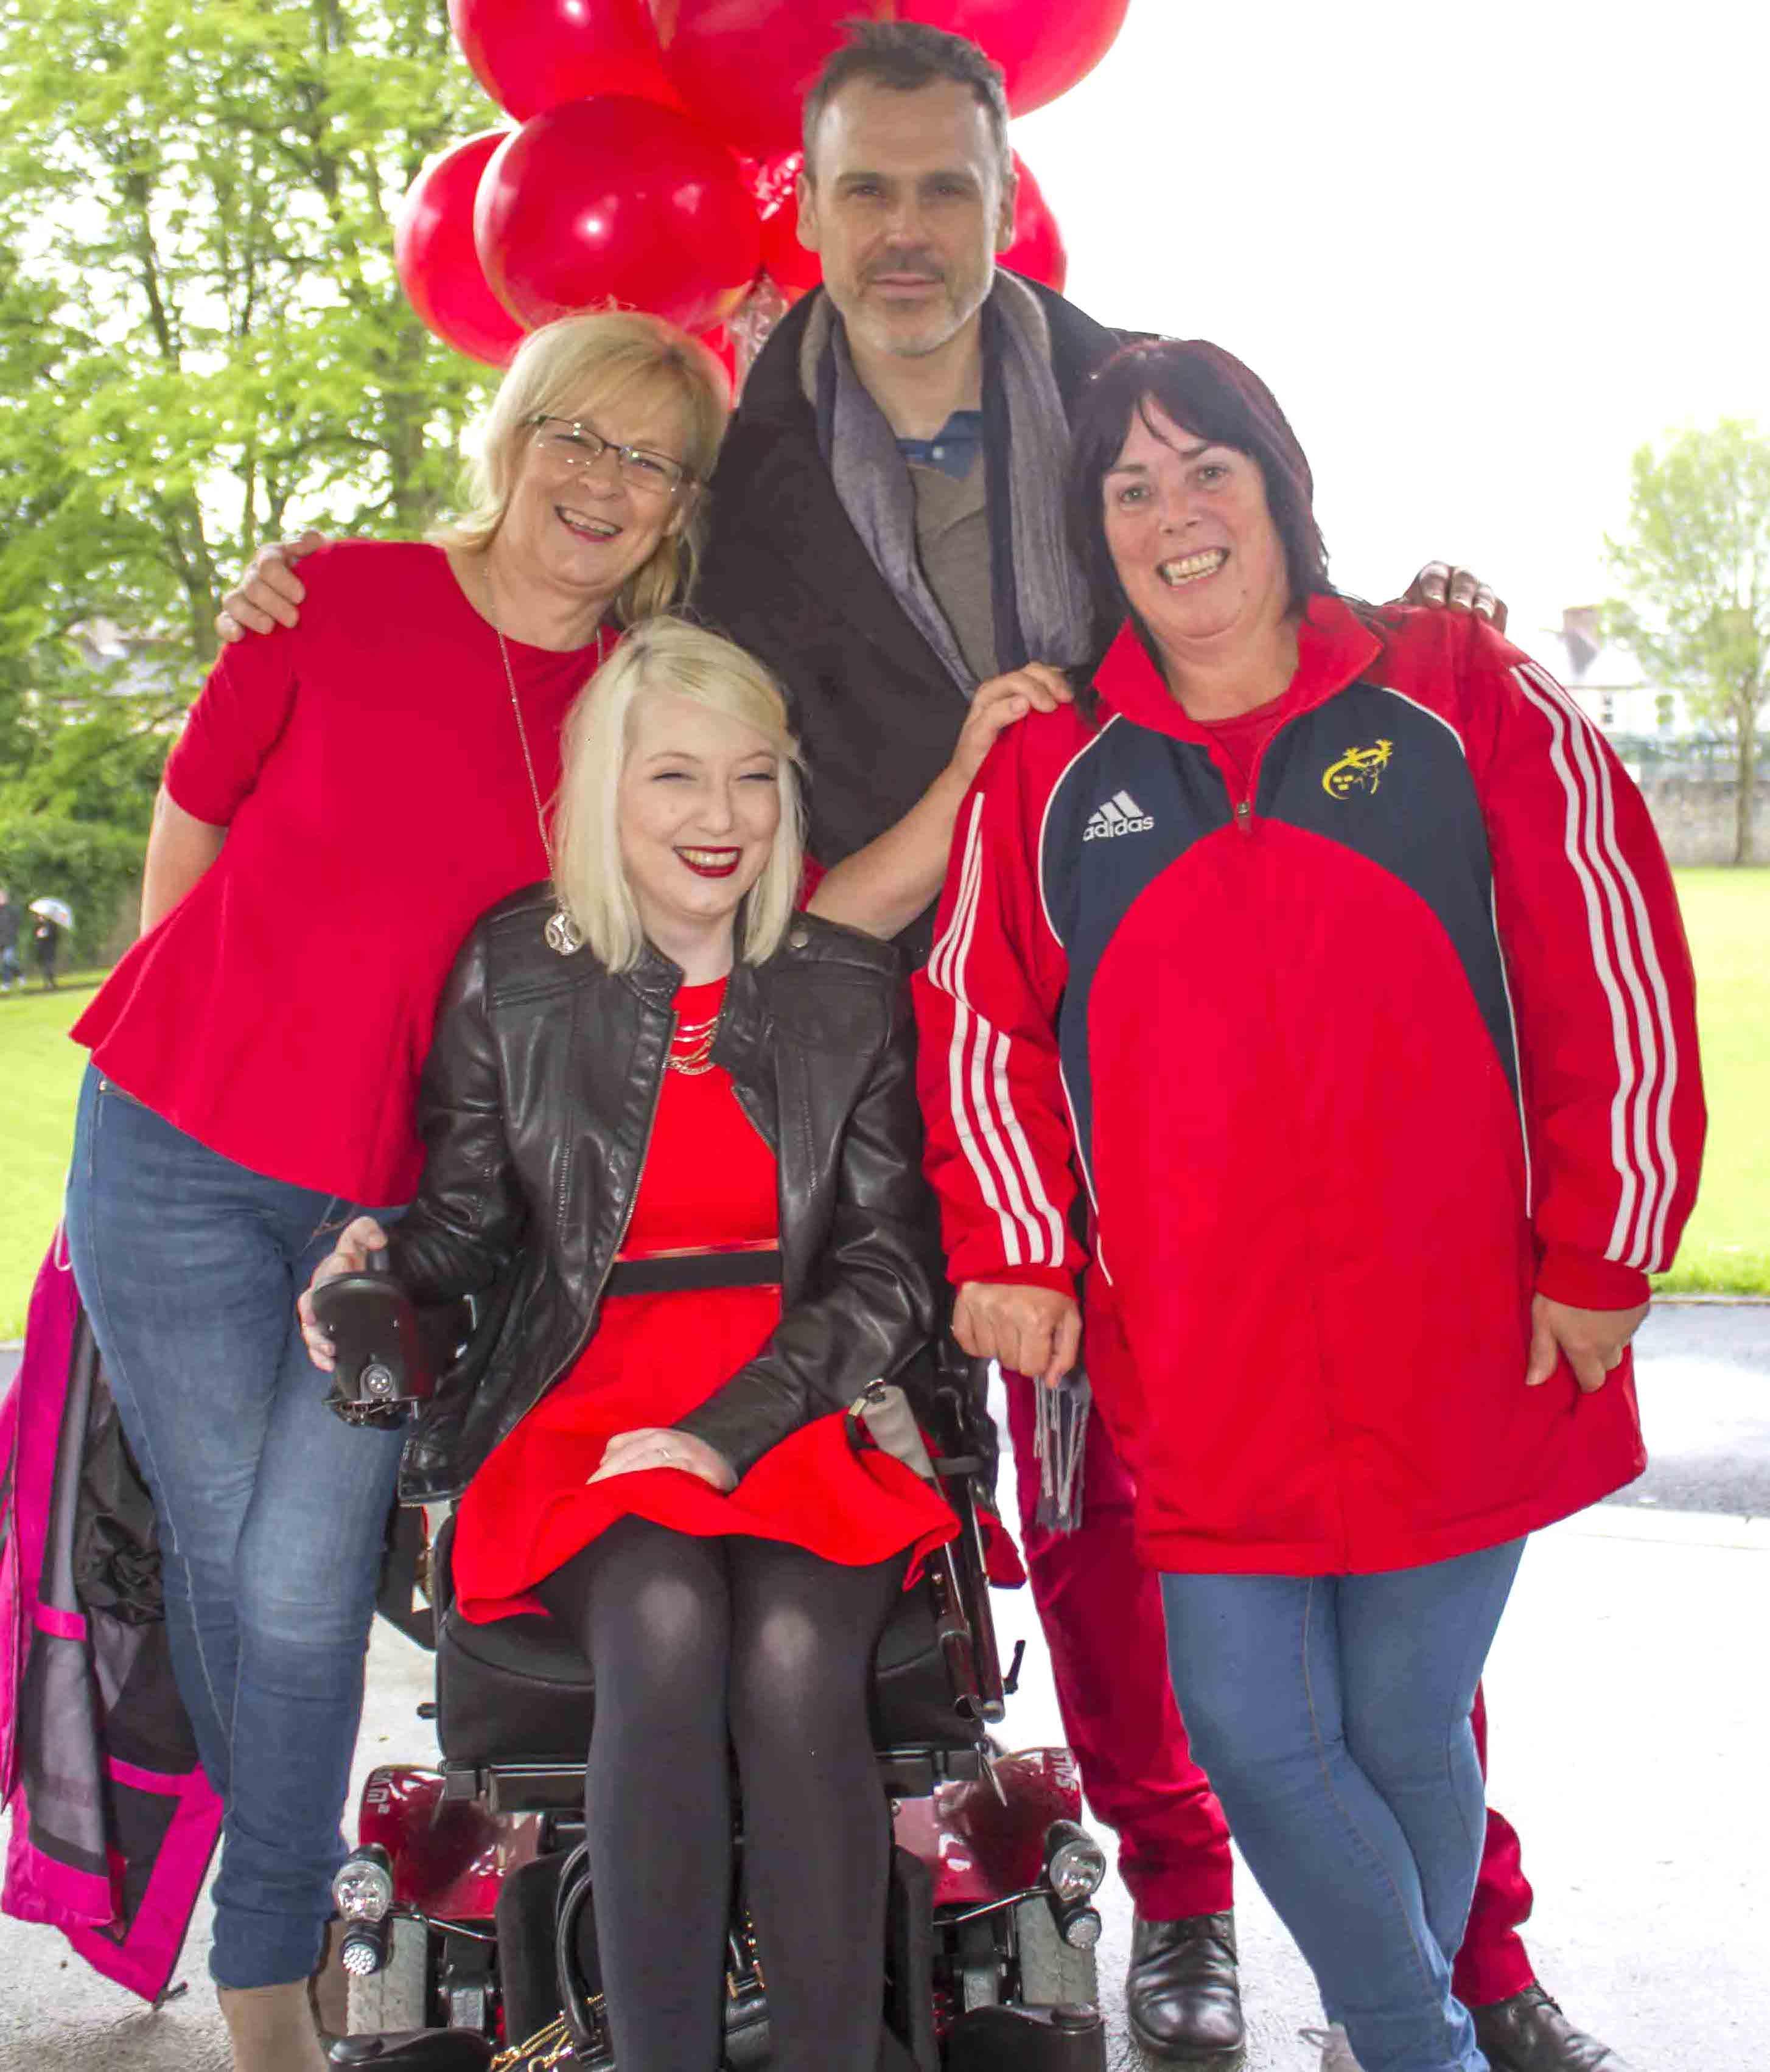 Amanda Corbett Soccer fundraiser 2016 - Richard with Dorothy Meaney, her daughter Zondra Meaney and Pauline Corbett, the mother of Amanda Corbett. Picture: Johnny Baynes/ilovelimerick.